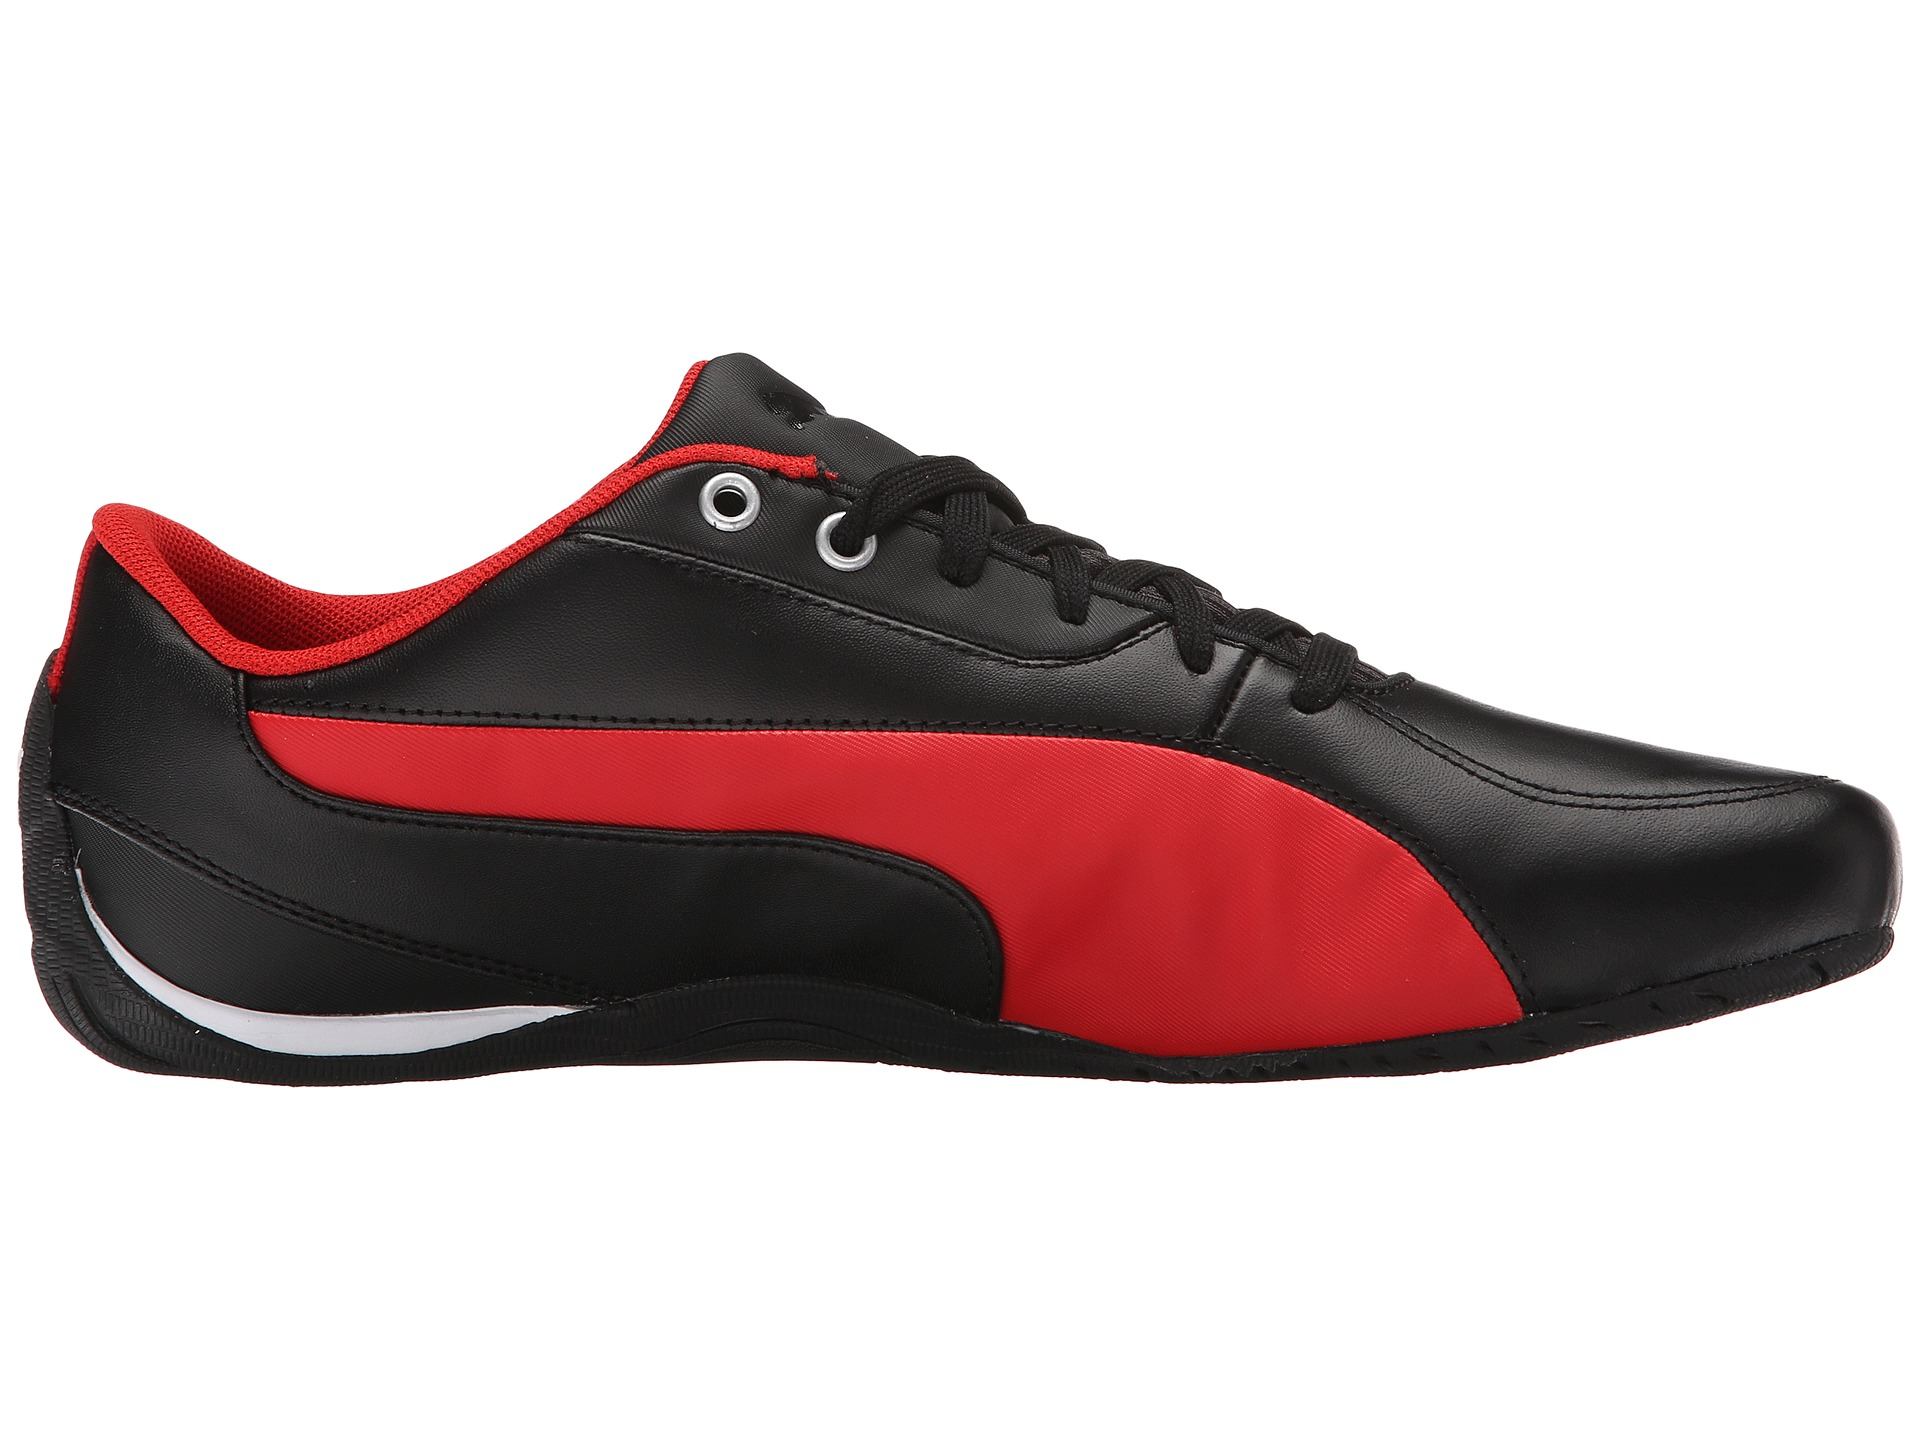 Lyst - PUMA Drift Cat 5 Sf Nm 2 in Red for Men 6603db4b8